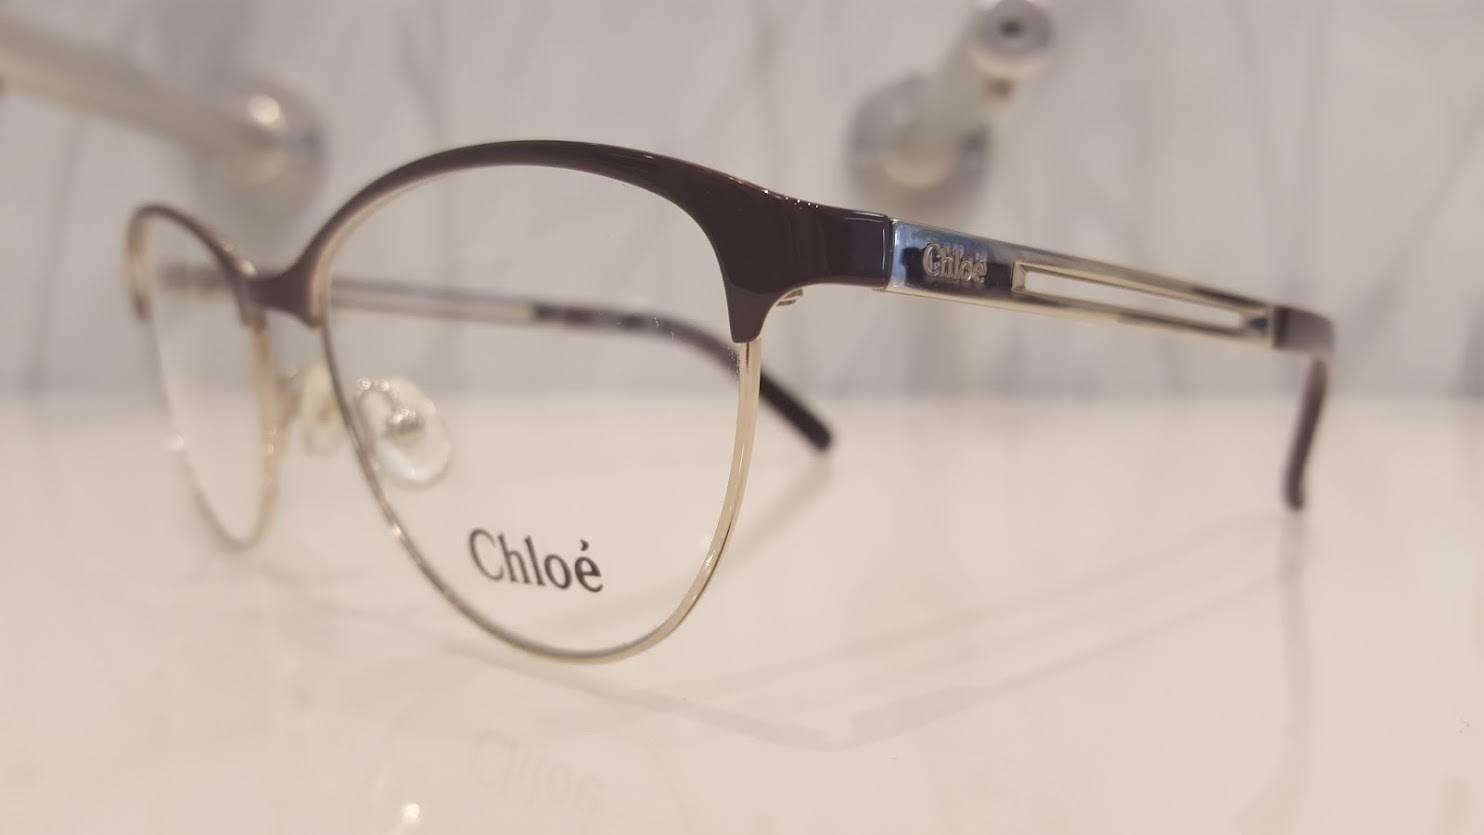 Chloe-eyeglasses